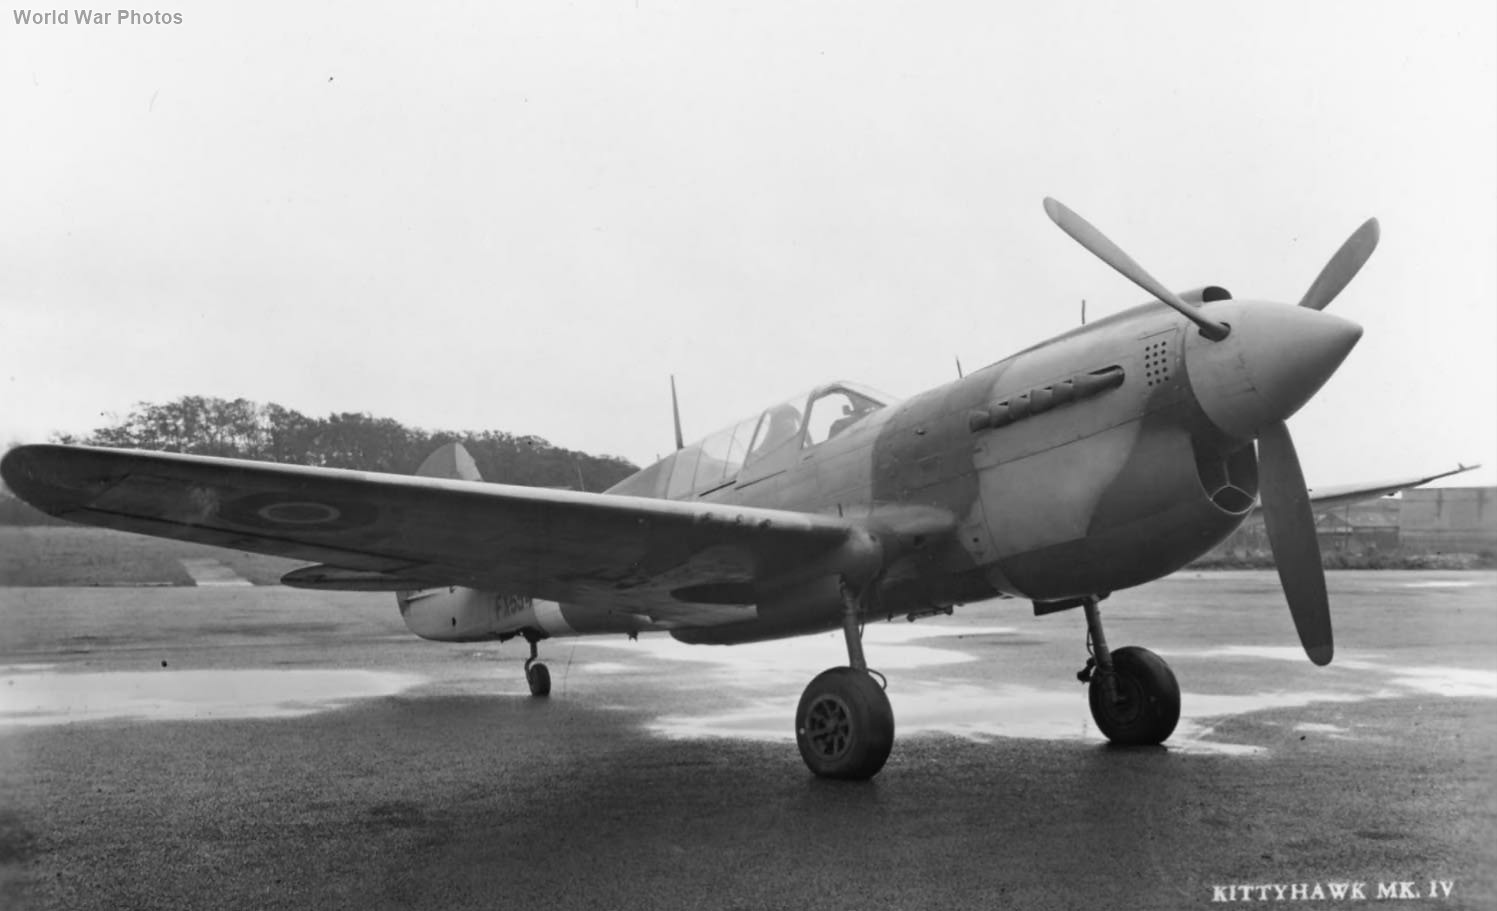 Kittyhawk IV FX594